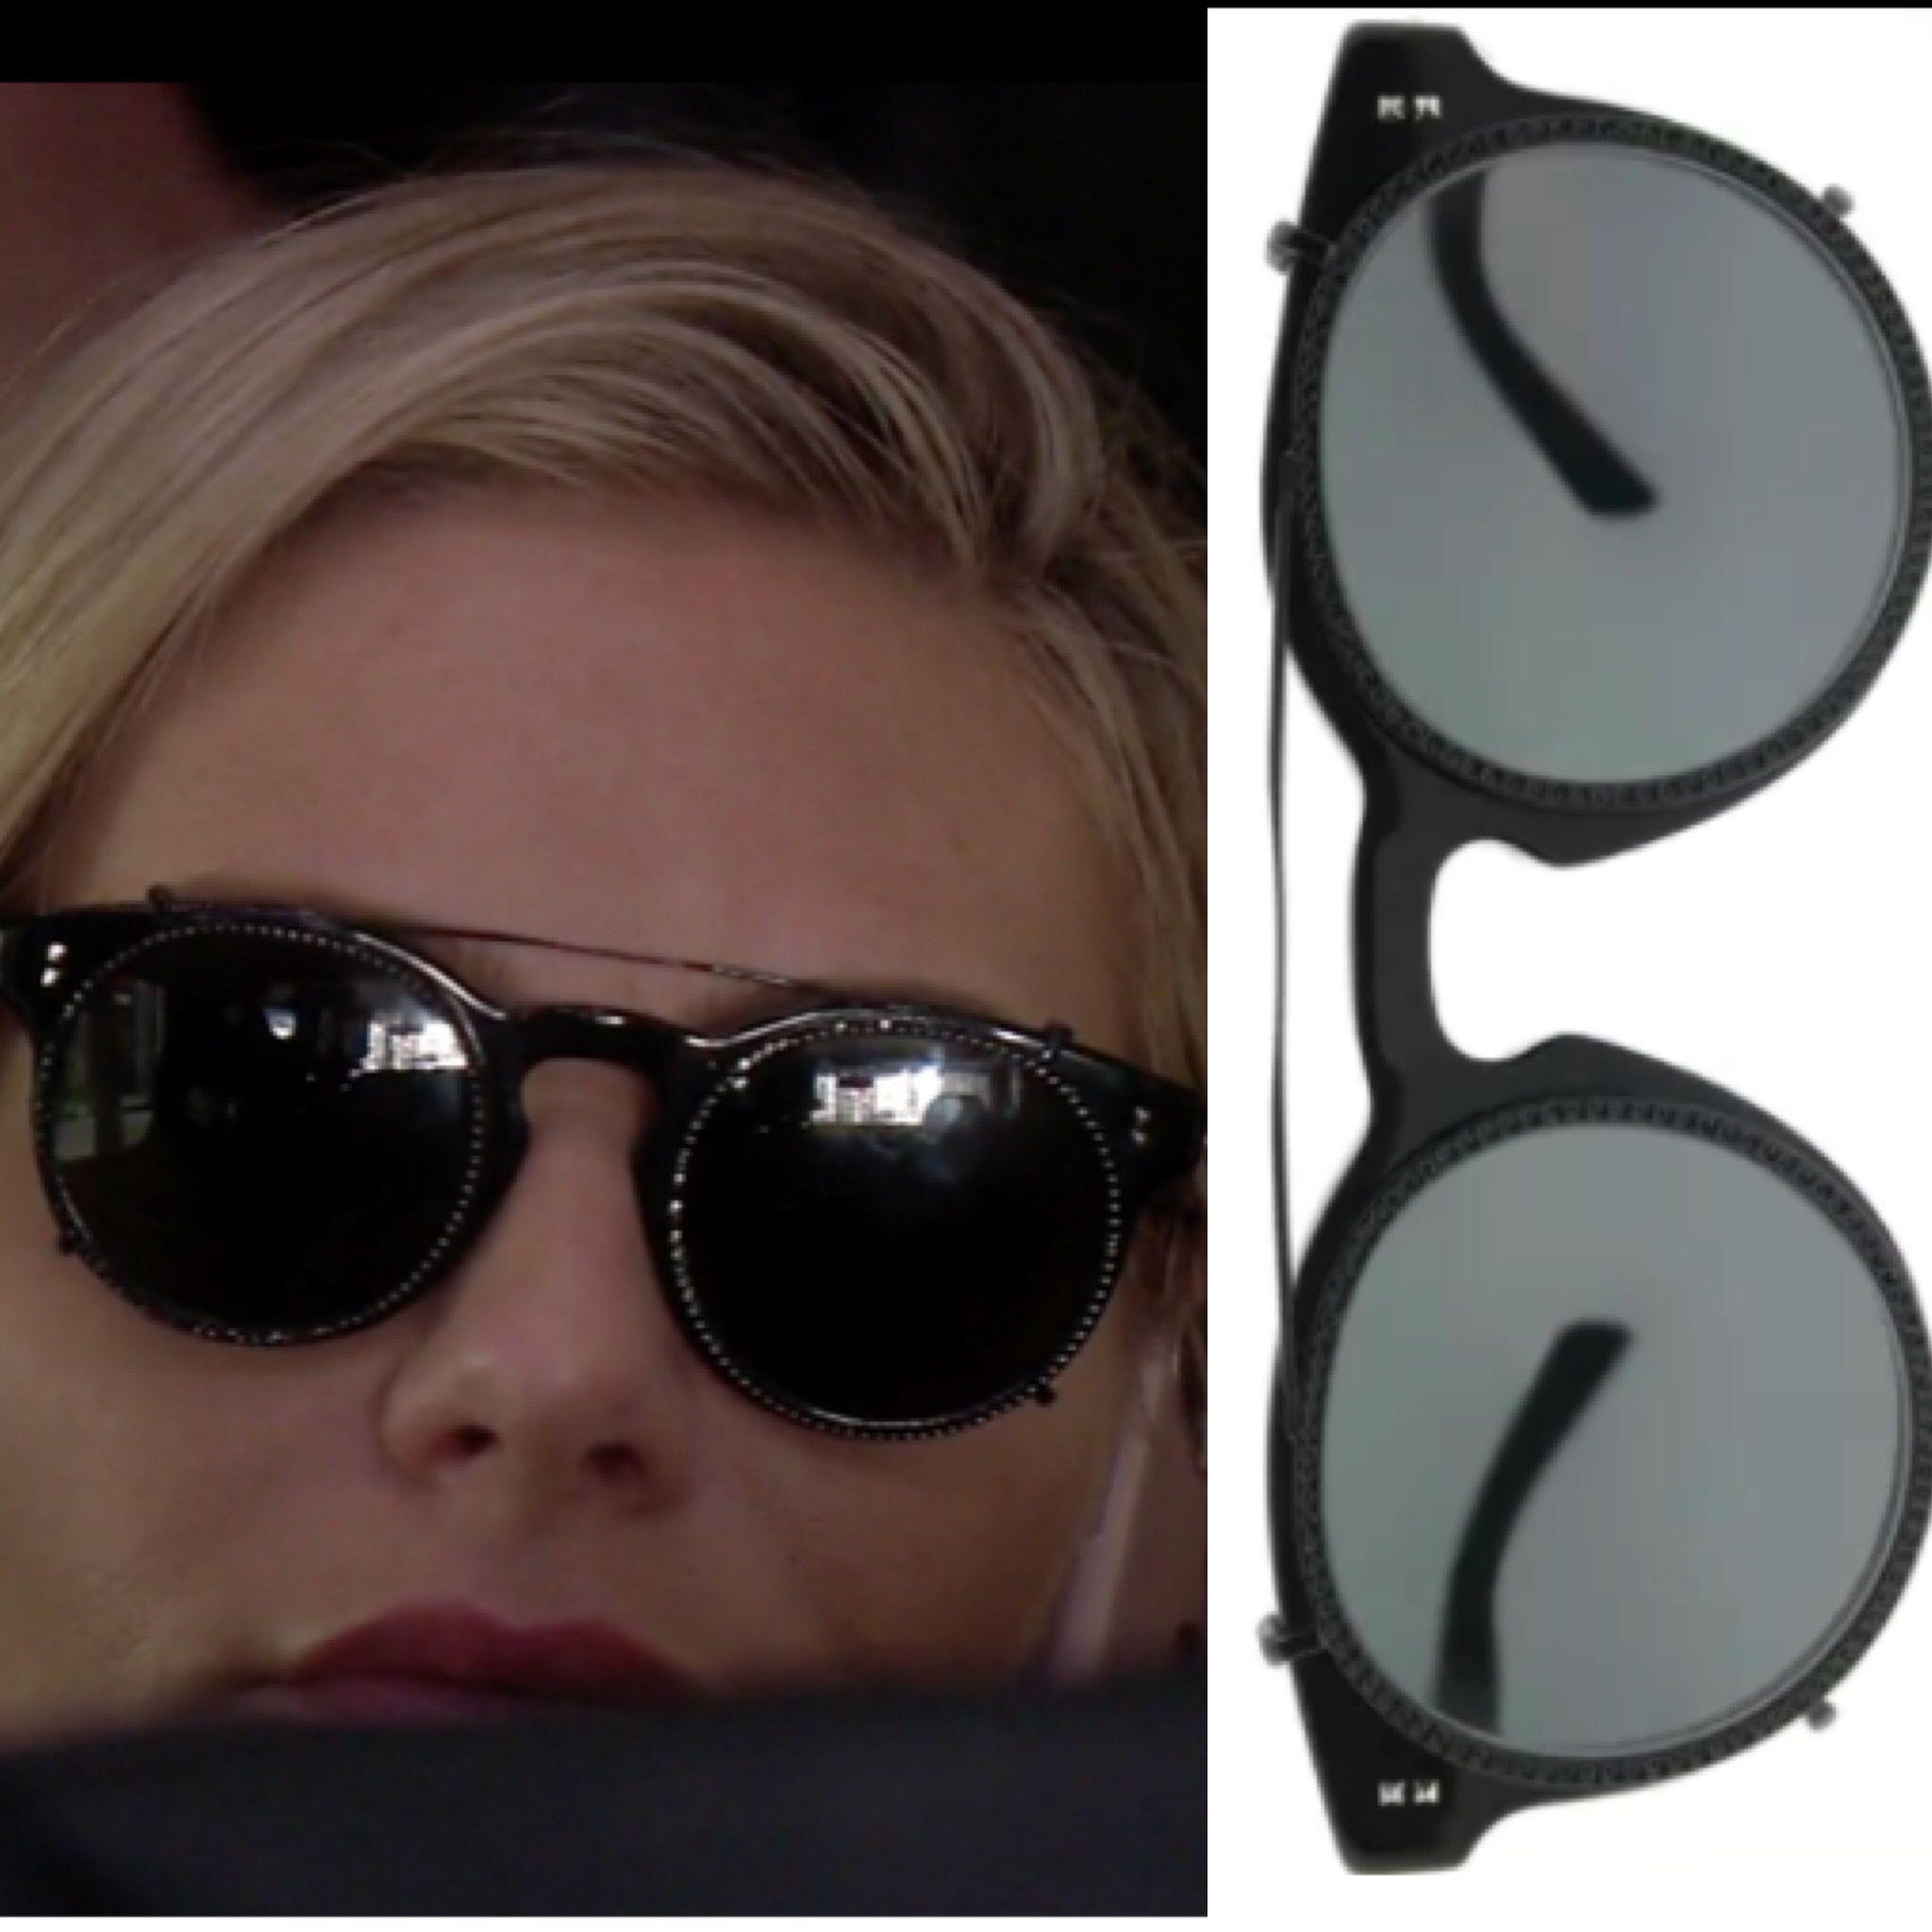 Dorit Kemsley S Round Black Sunglasses Black Sunglasses Black Round Sunglasses Sunglasses